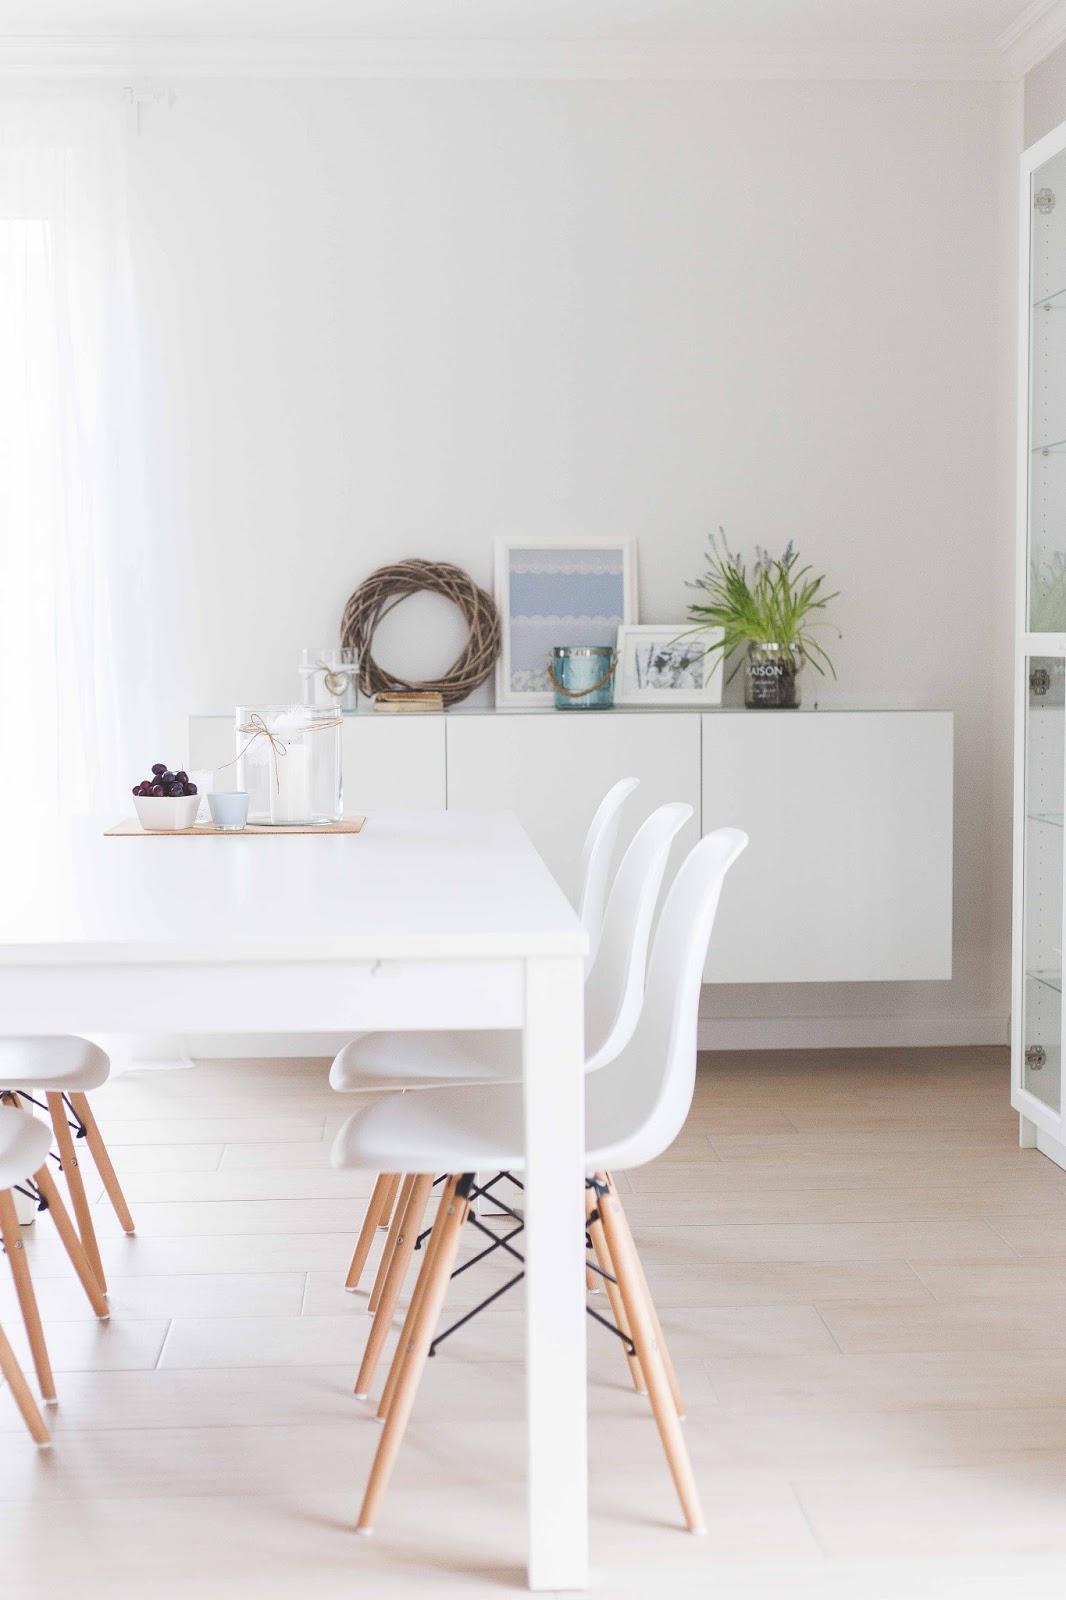 lebensimpressionen unser wohnzimmer im februar. Black Bedroom Furniture Sets. Home Design Ideas